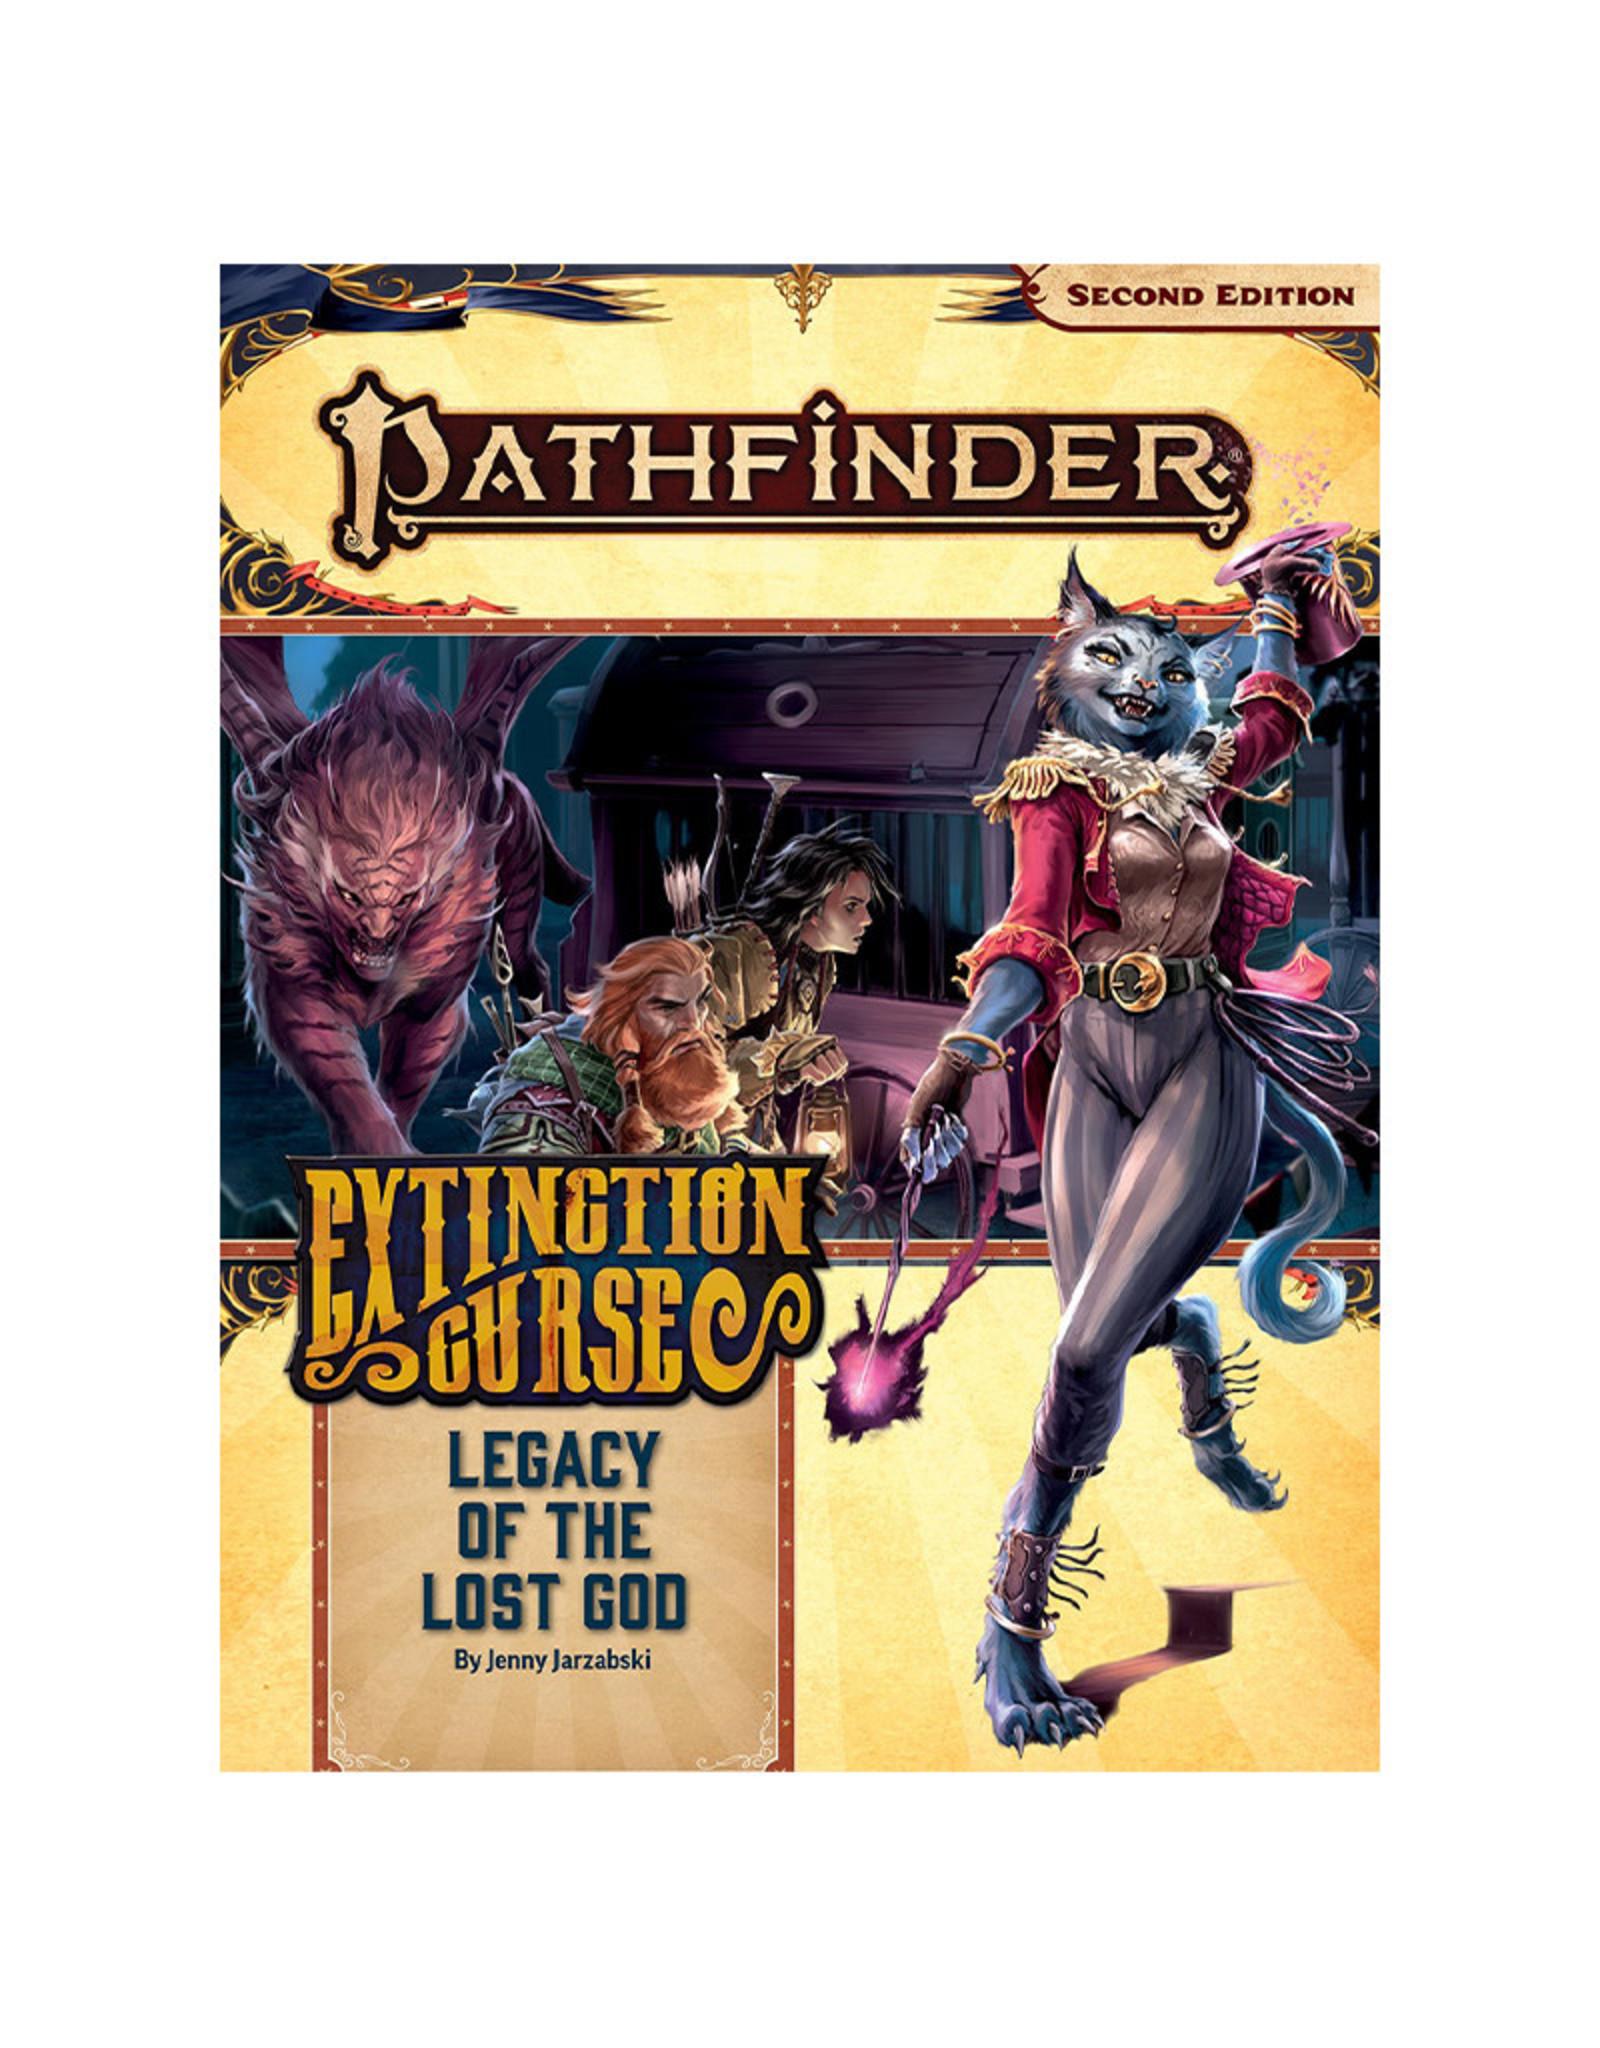 Paizo Pathfinder RPG: AP Extinction curse PT 2 Legacy of the Lost Gods